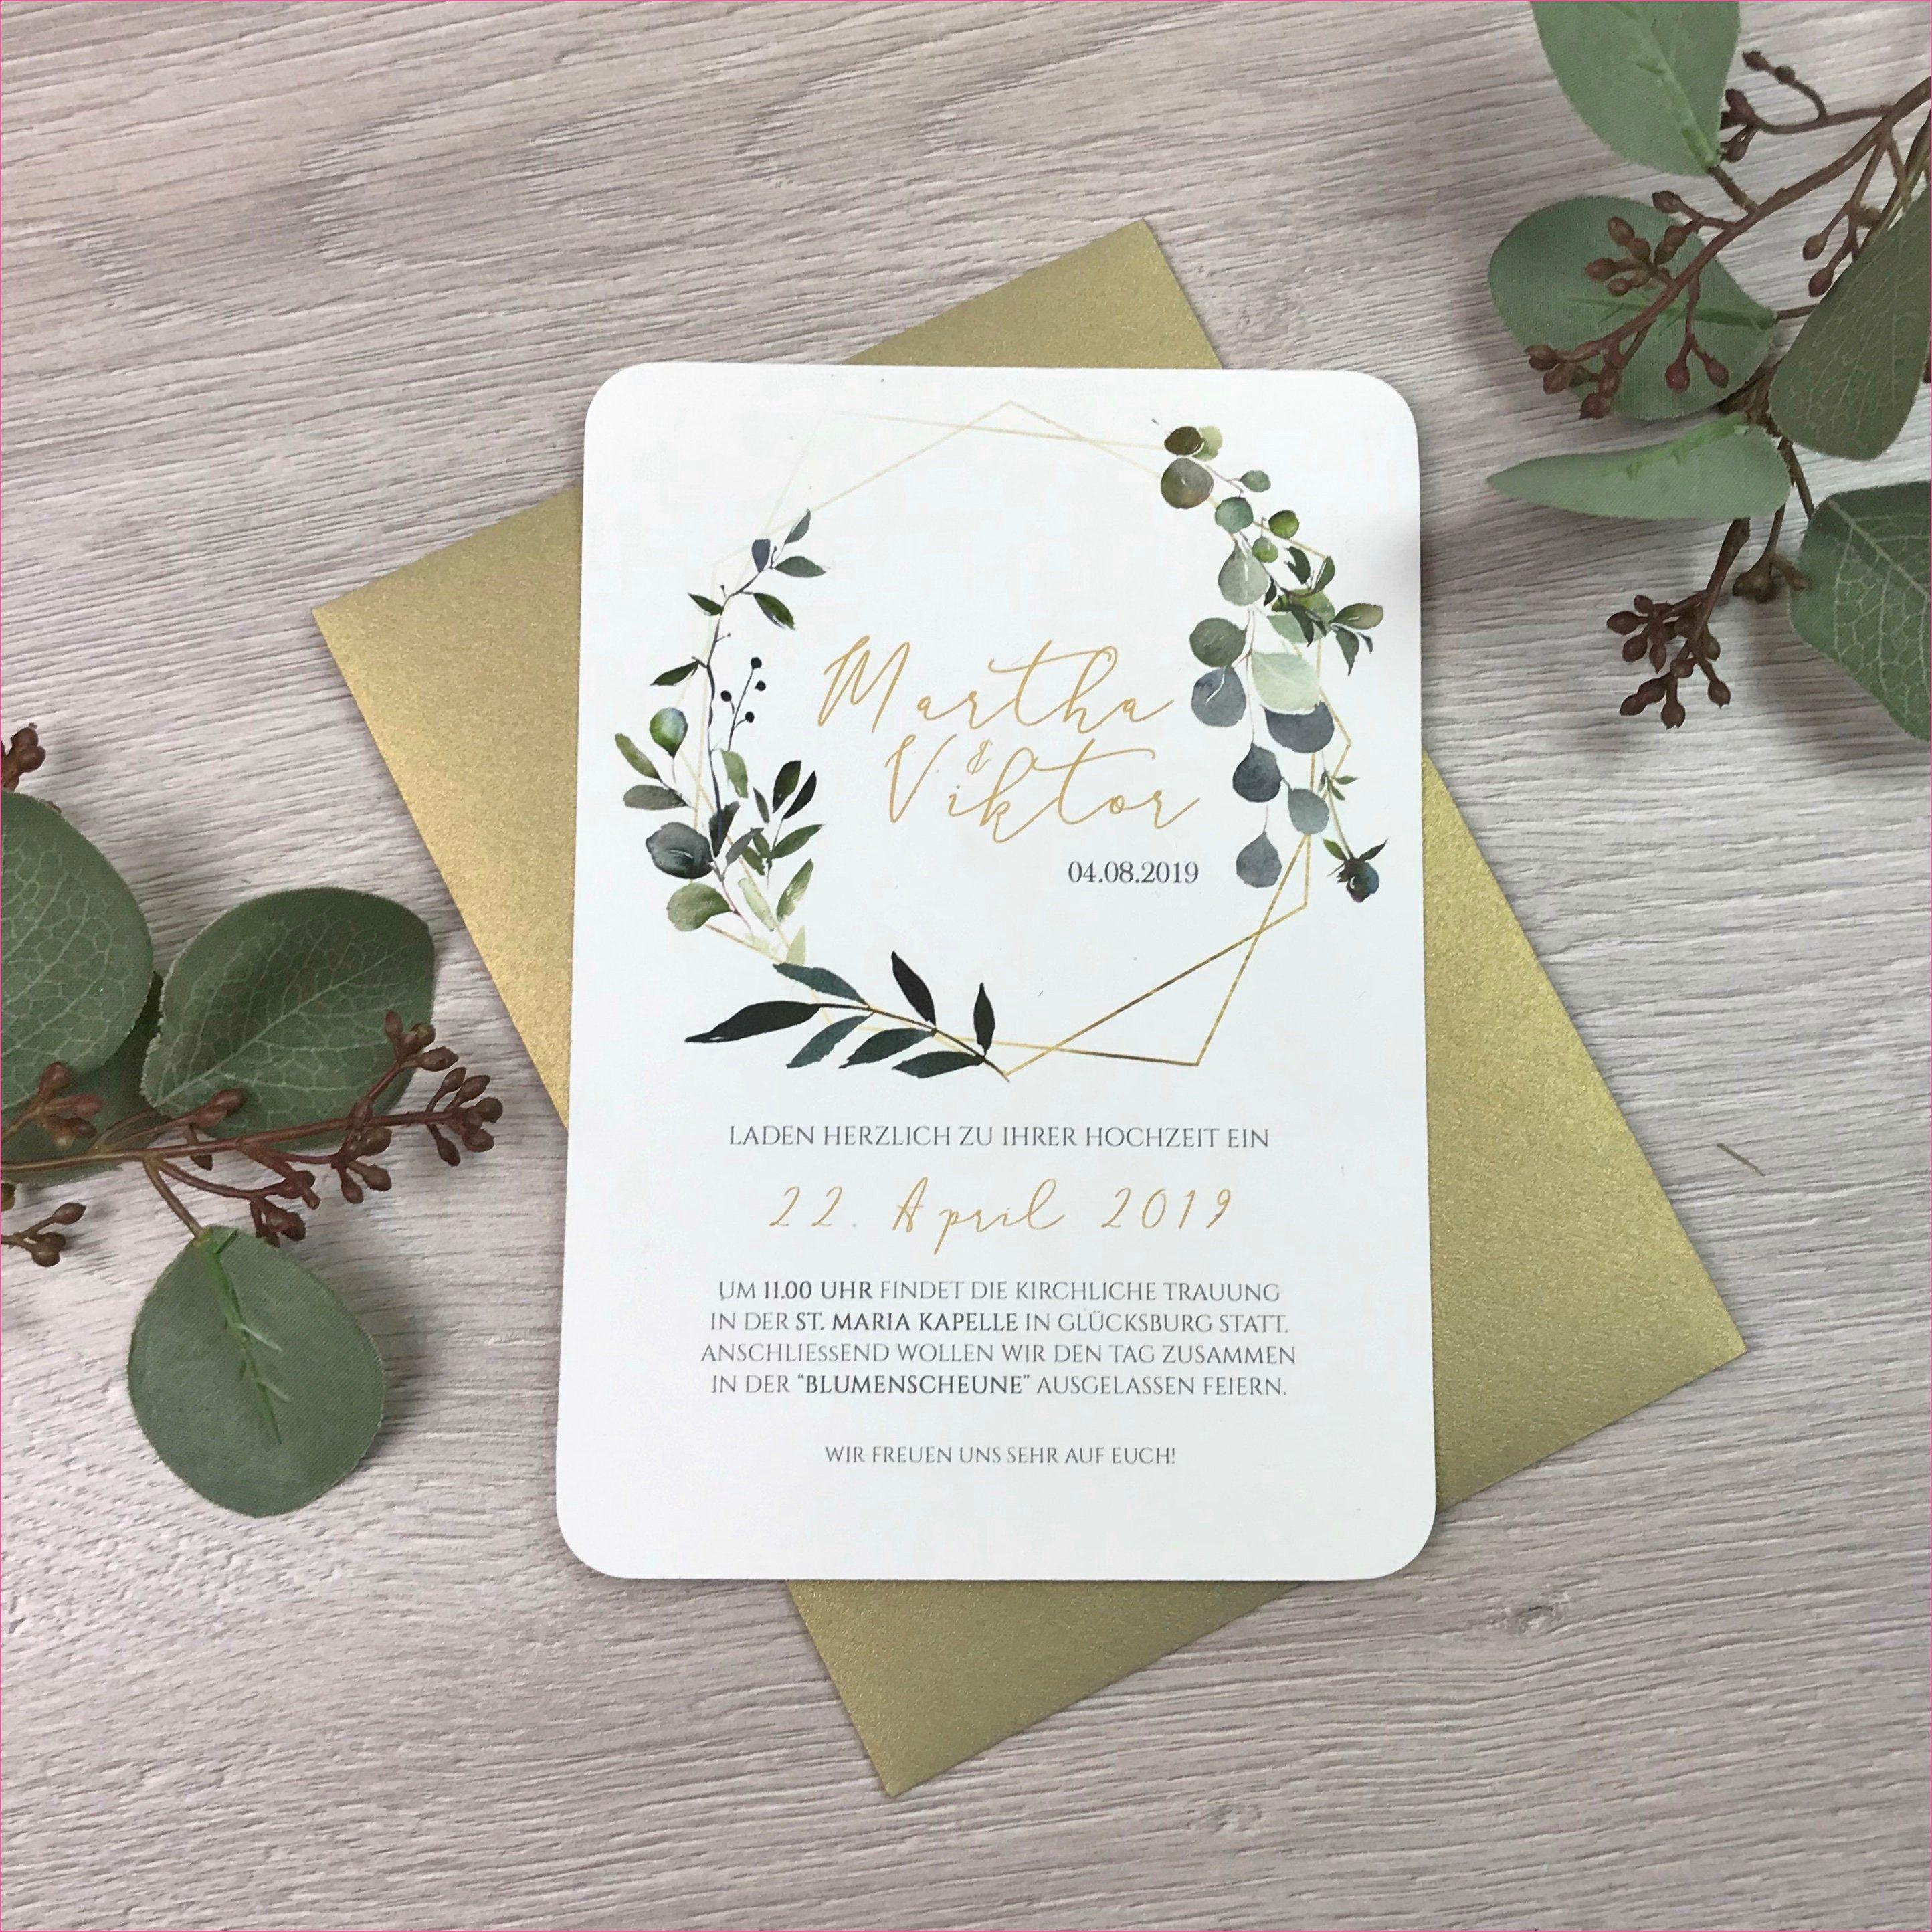 Beschwerdebrief An Vw Muster Wedding Invitations